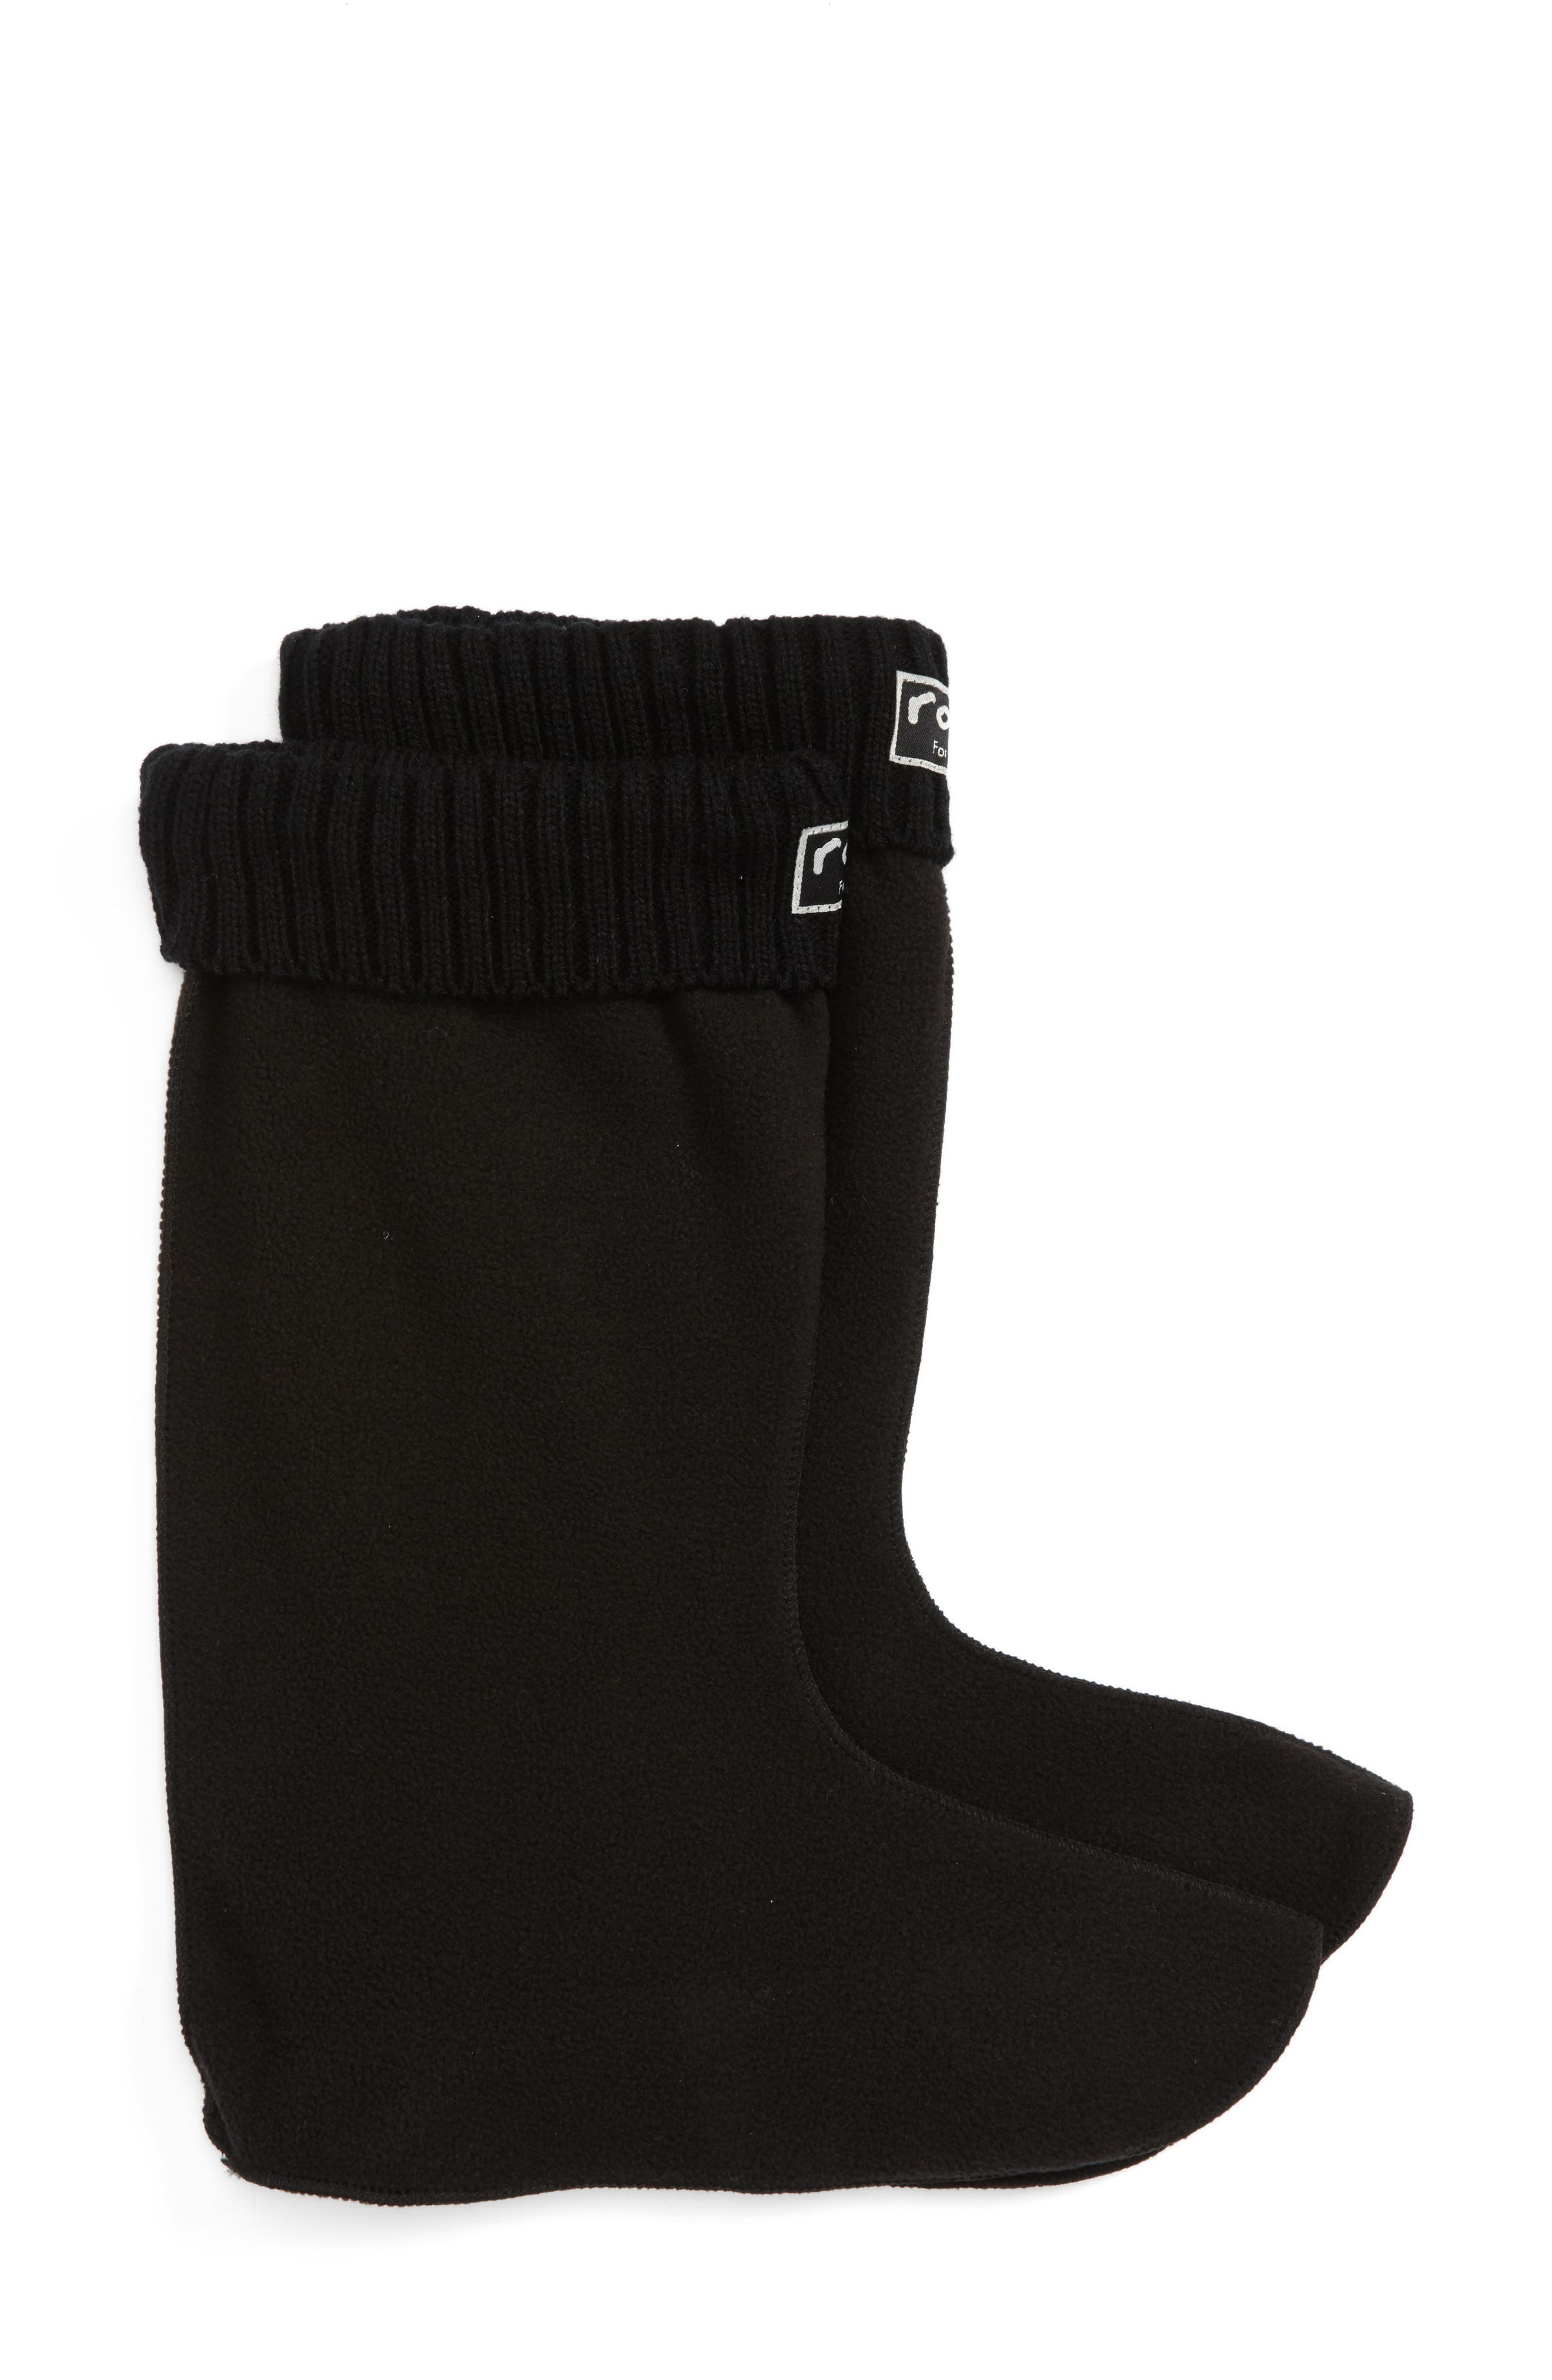 Knit Cuff Fleece Boot Socks,                         Main,                         color, 002